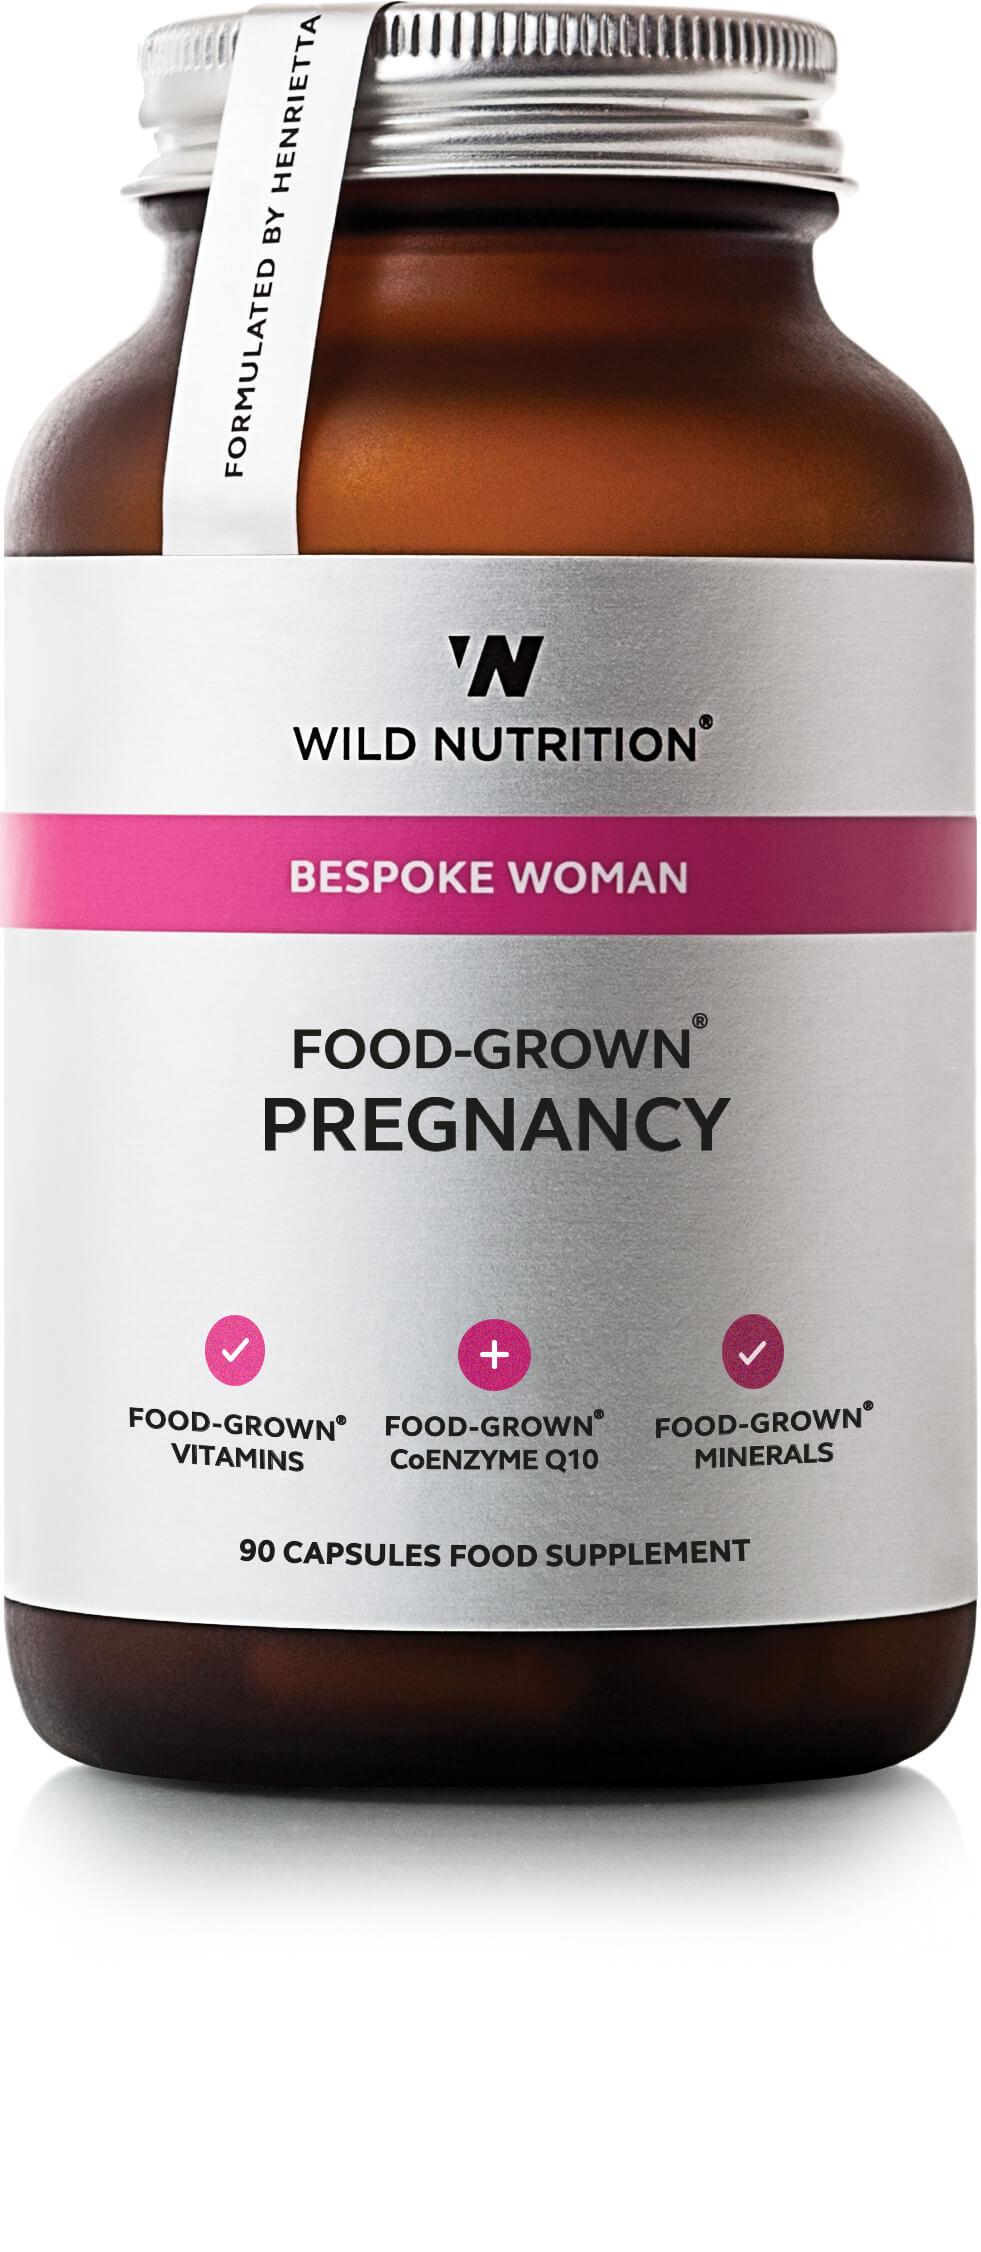 Bespoke Woman Food-Grown Pregnancy 90's